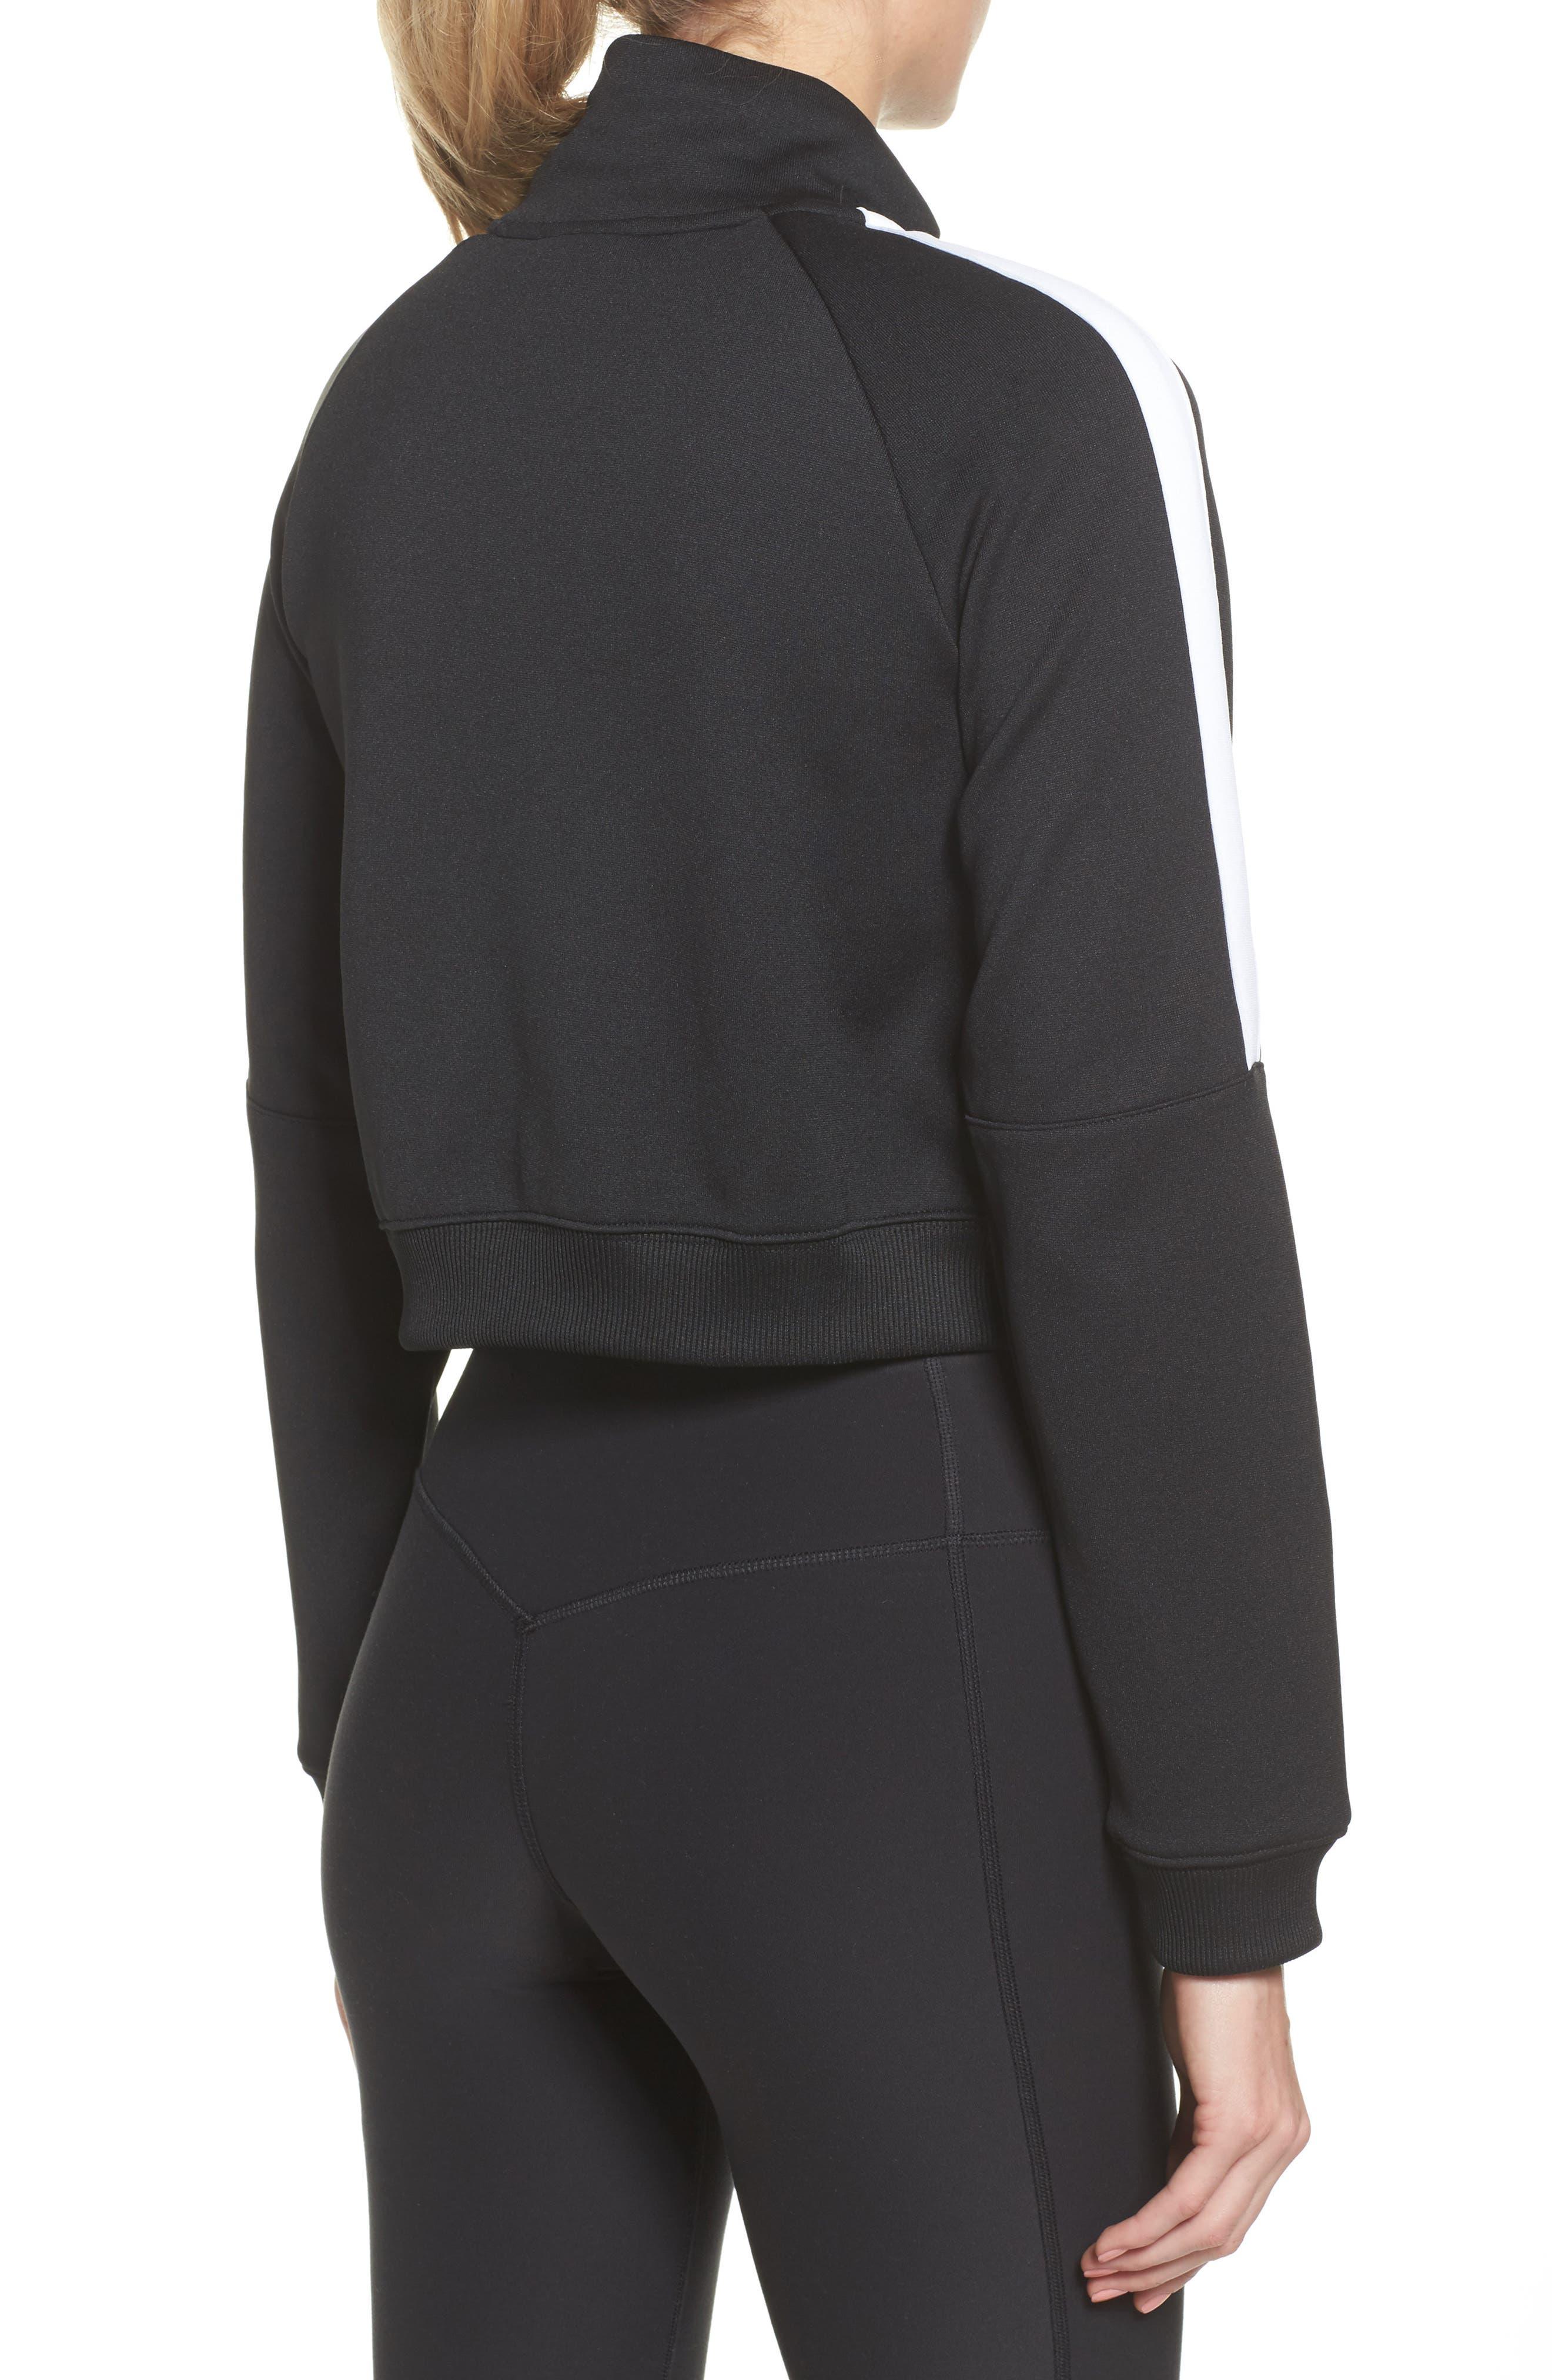 Sportswear N98 Jacket,                             Alternate thumbnail 2, color,                             010